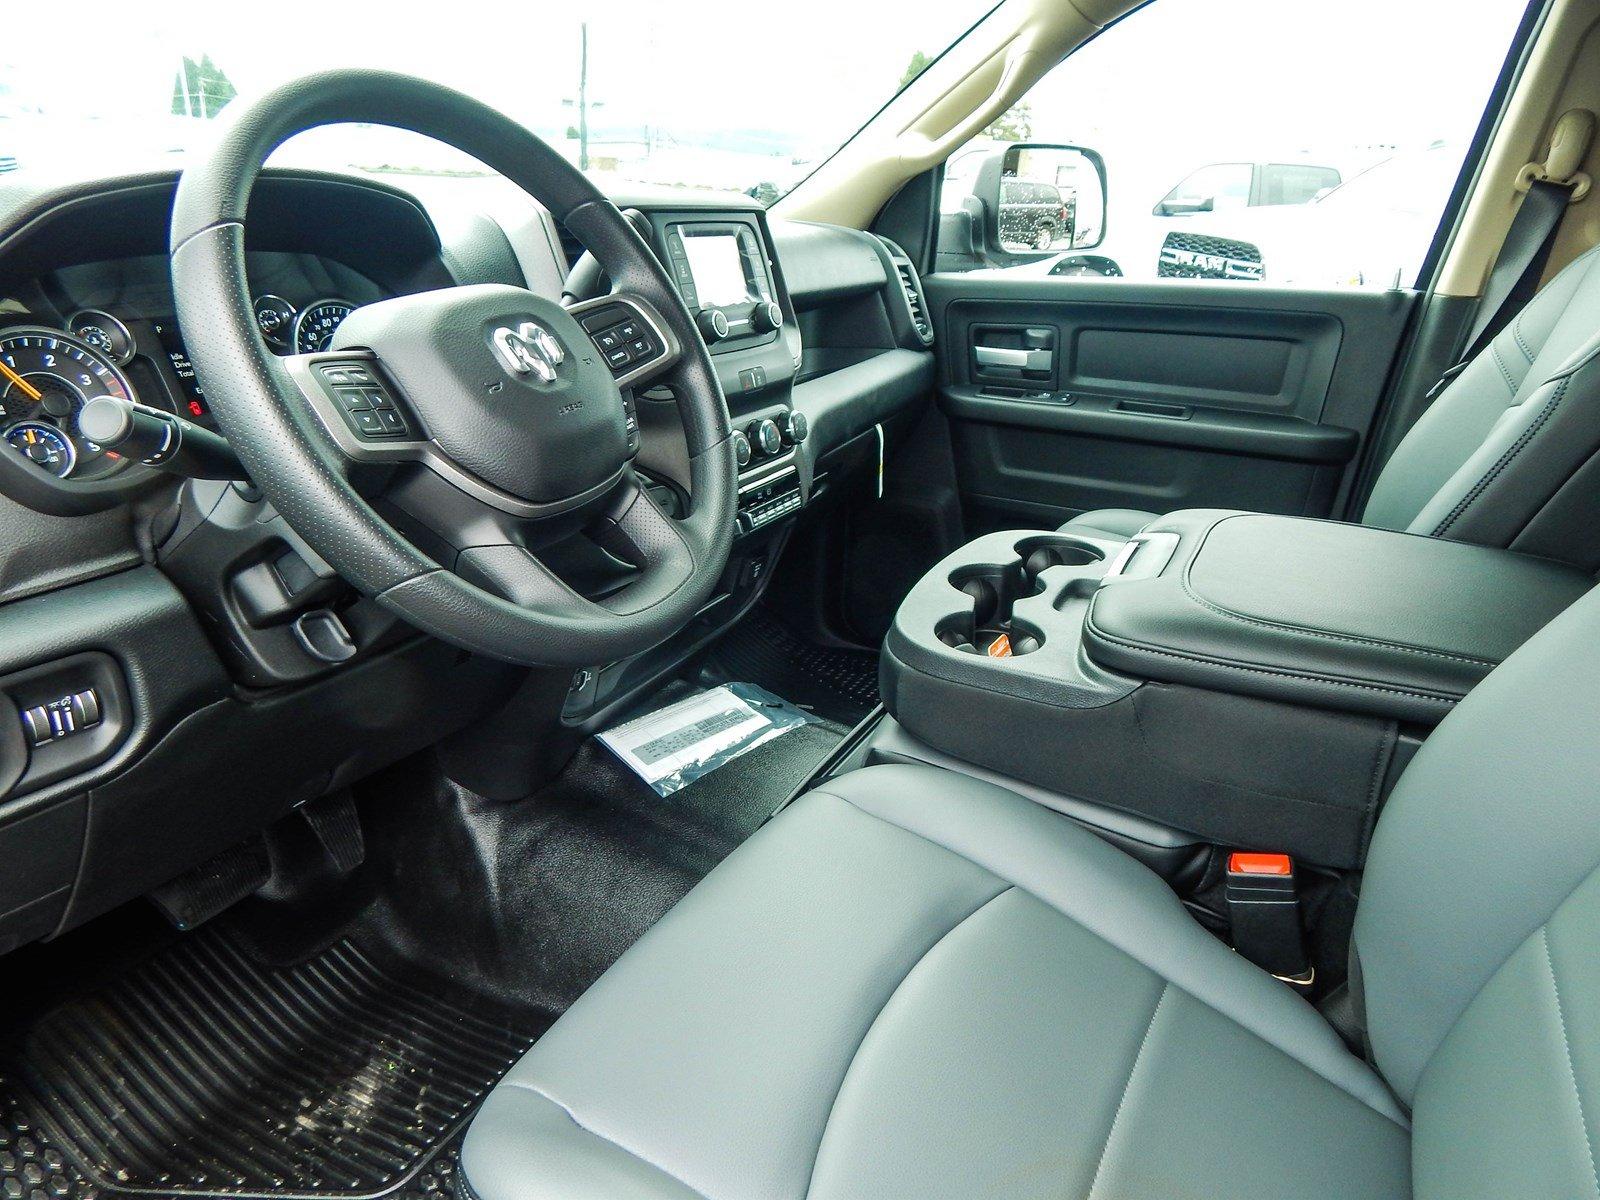 2019 Ram 3500 Crew Cab DRW 4x4, Cab Chassis #R1781 - photo 8